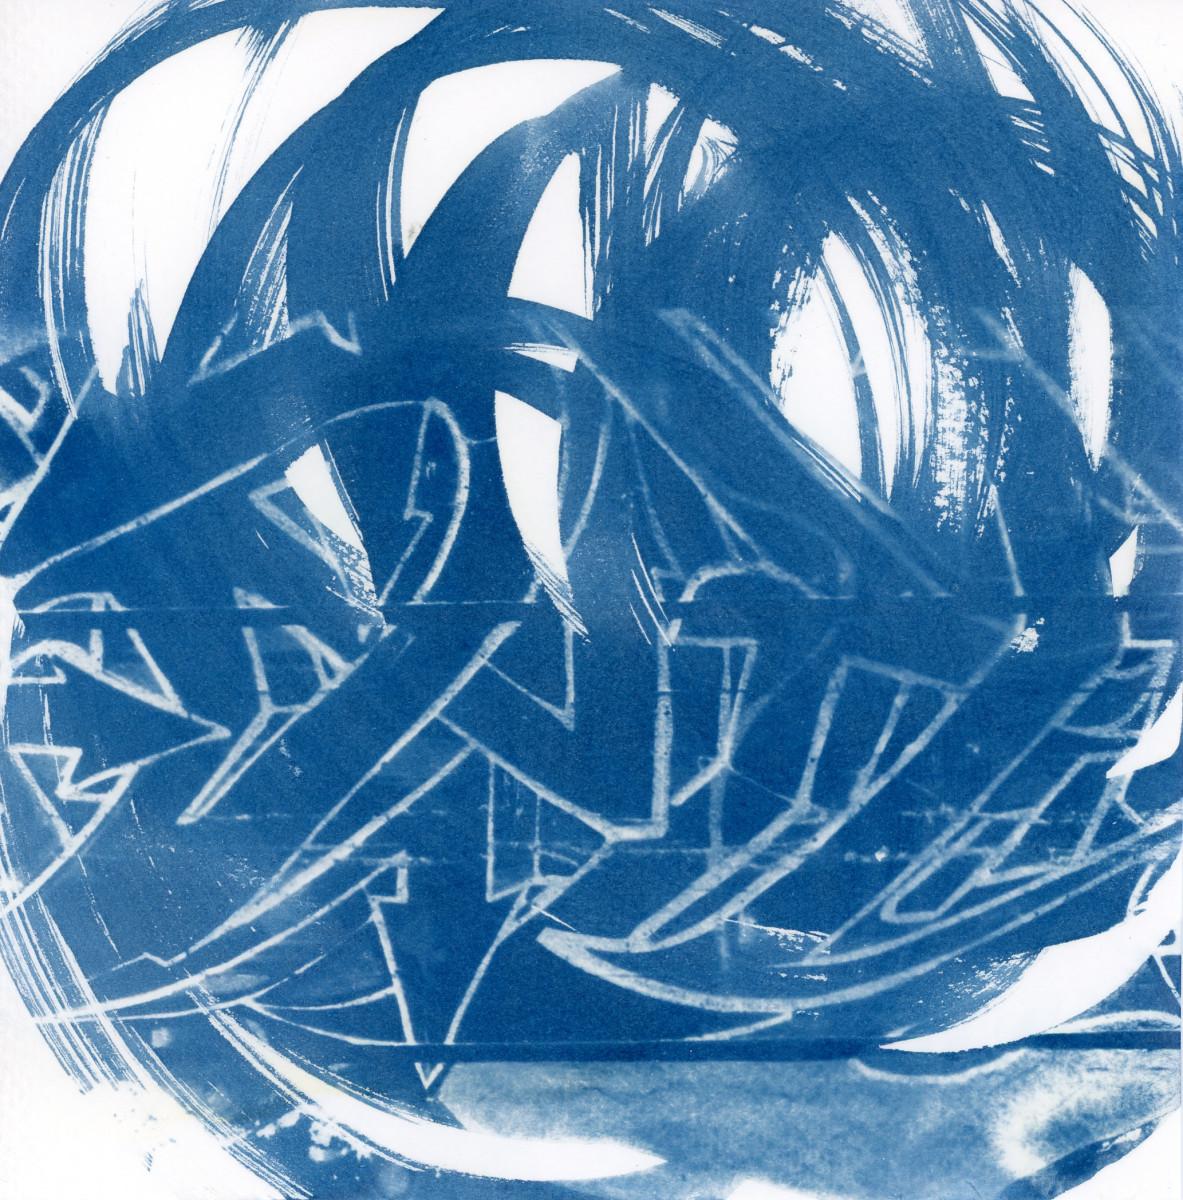 Cyanotype 20191016001 by Karen Johanson